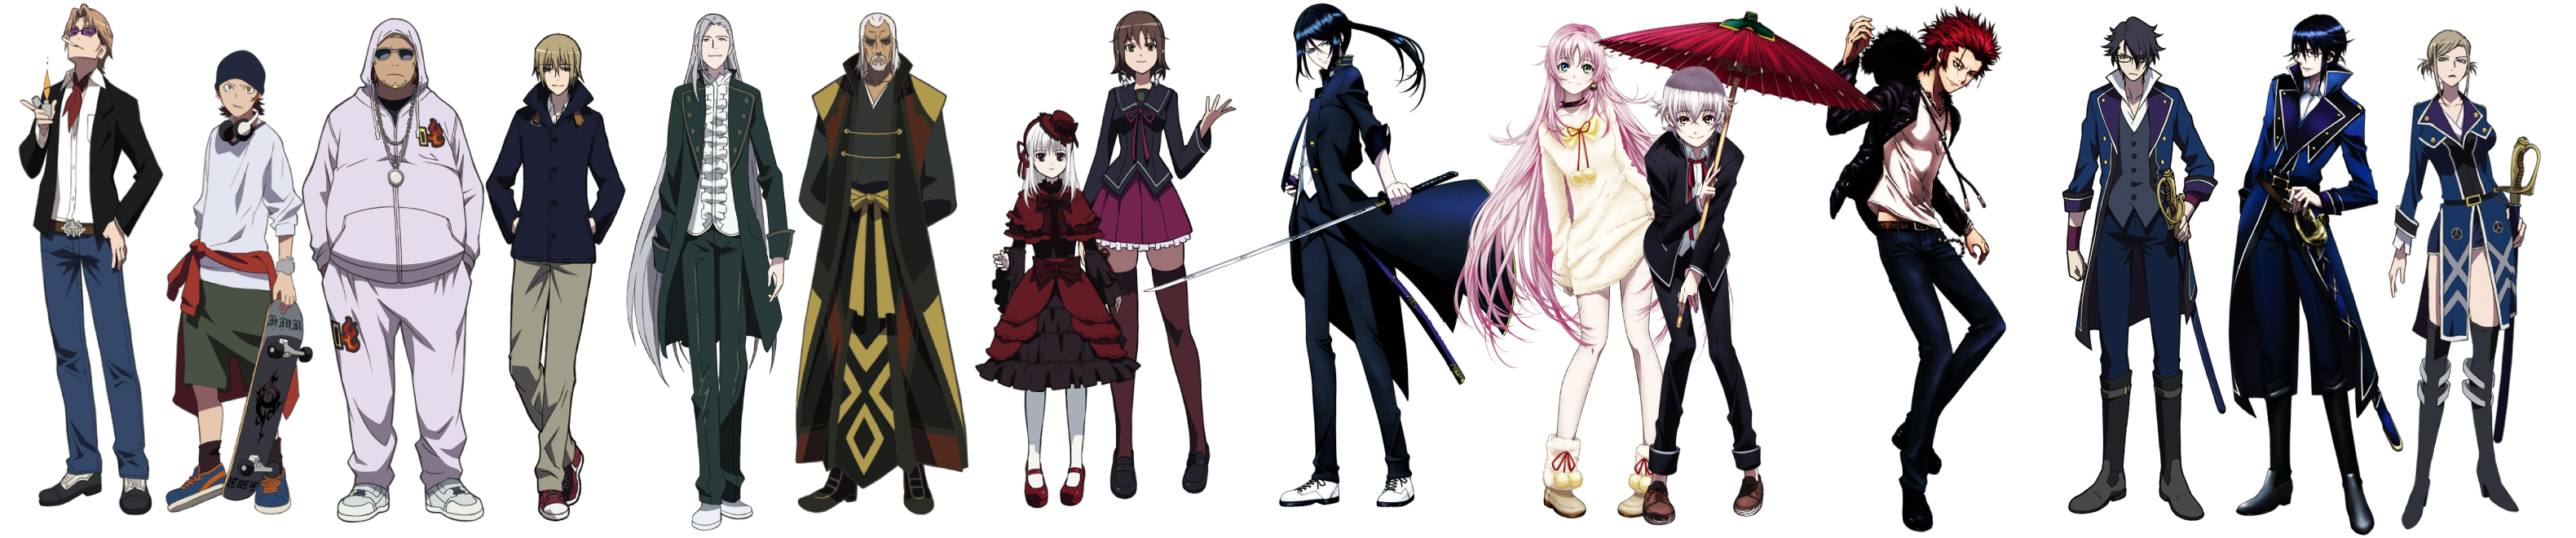 K Anime Logo k anime characters